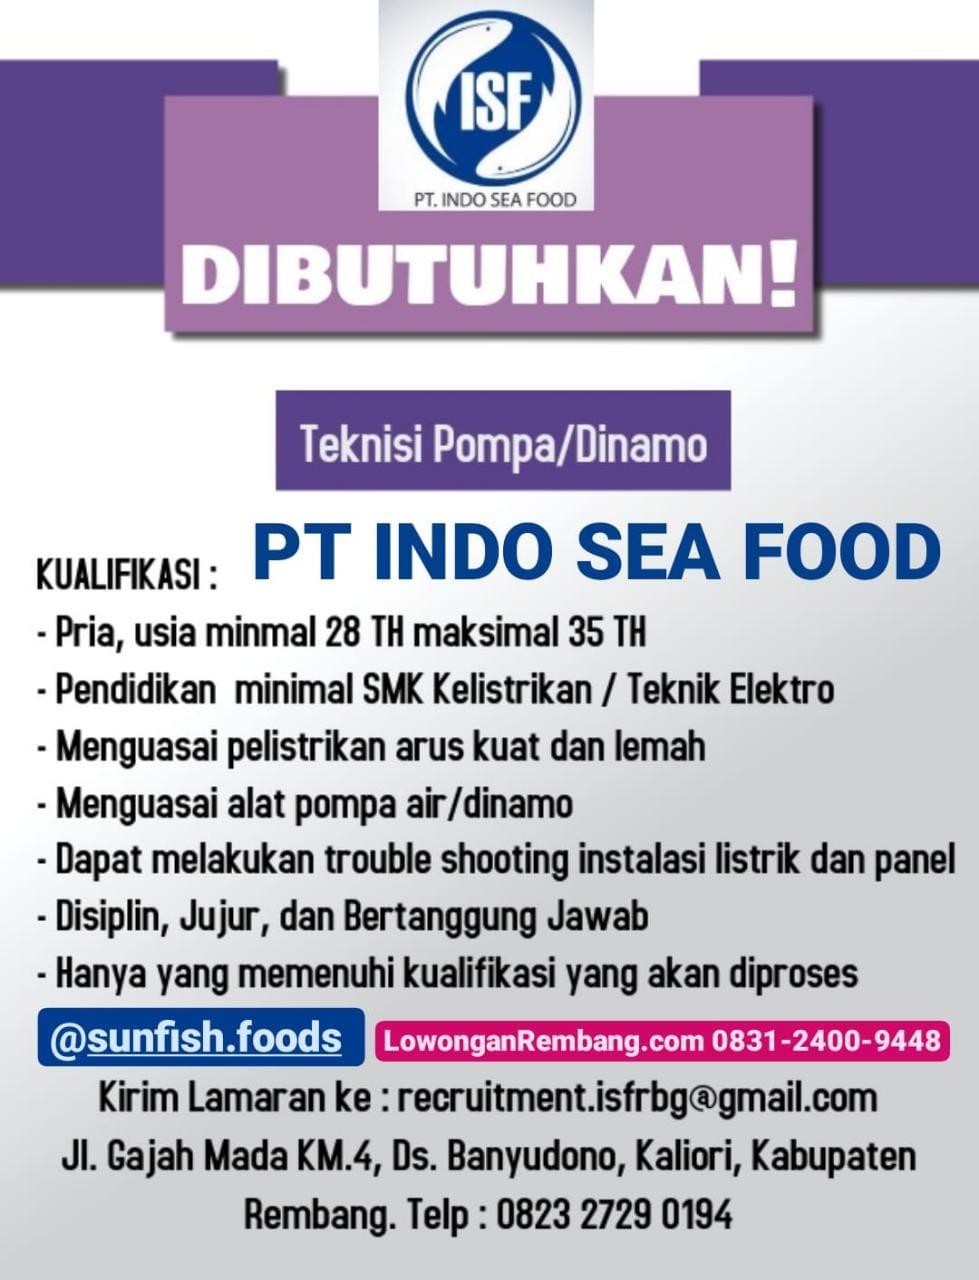 SEGERA Lamar Lowongan Kerja Teknisi Pompa Dinamo PT Indo Sea Food Banyudono Kaliori Rembang